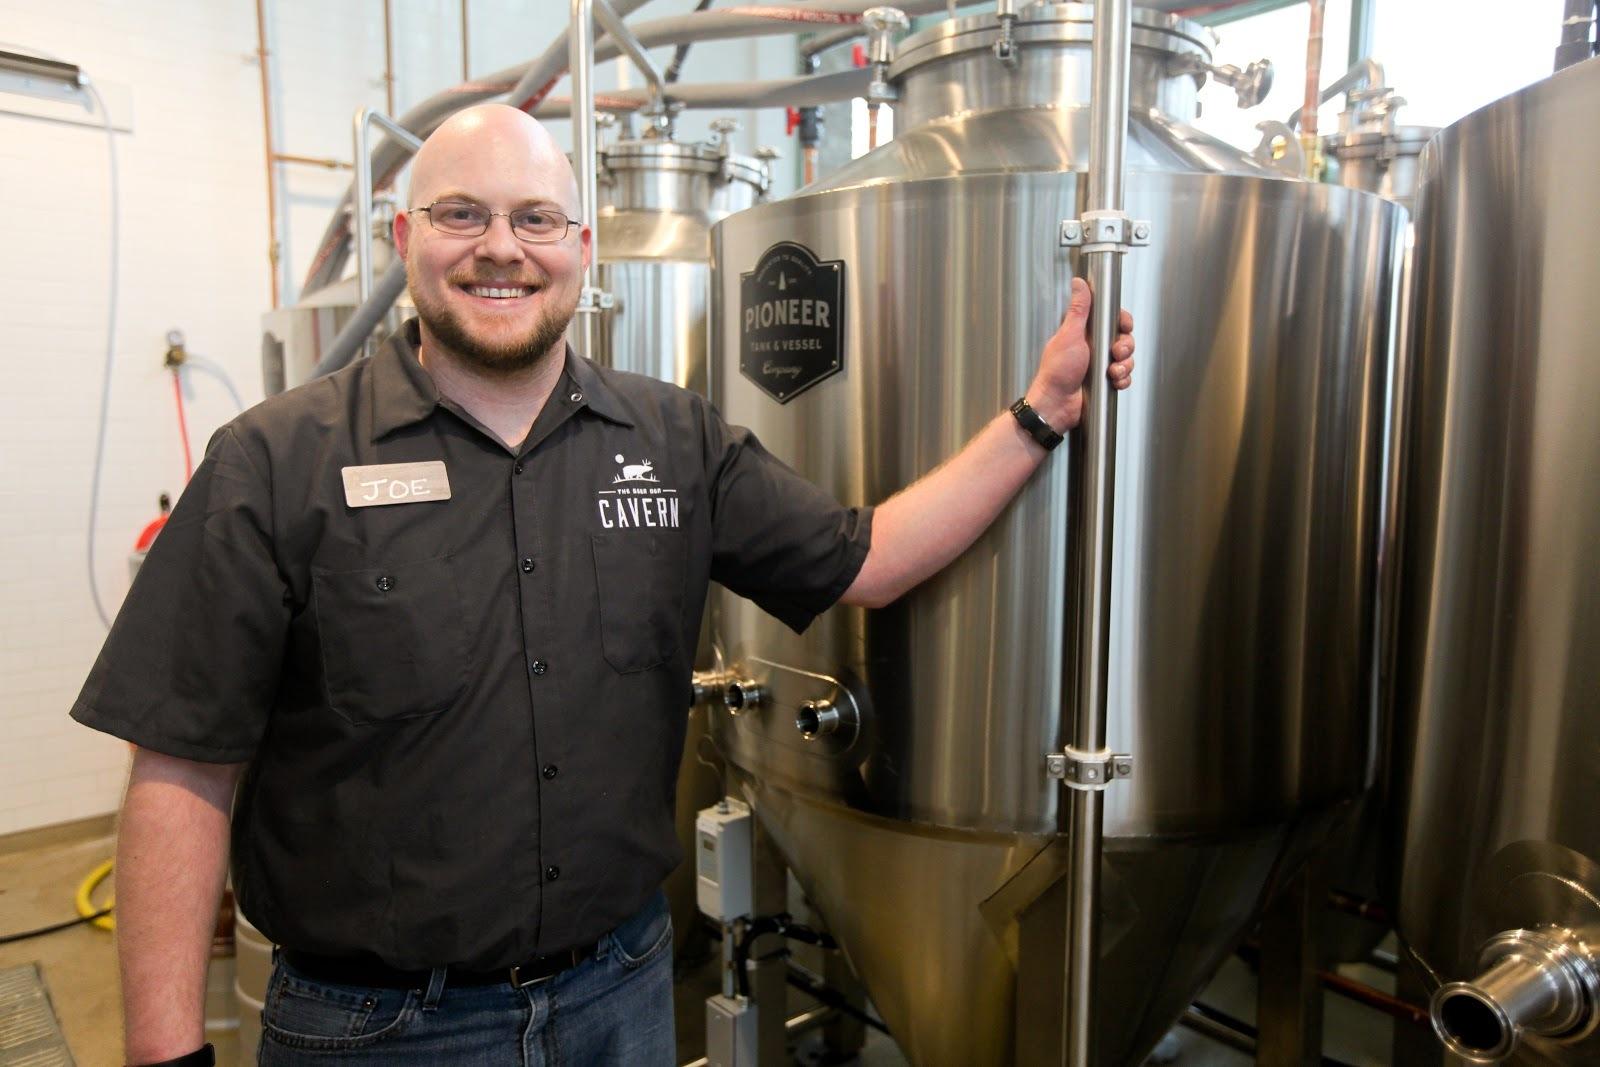 man in front of beer